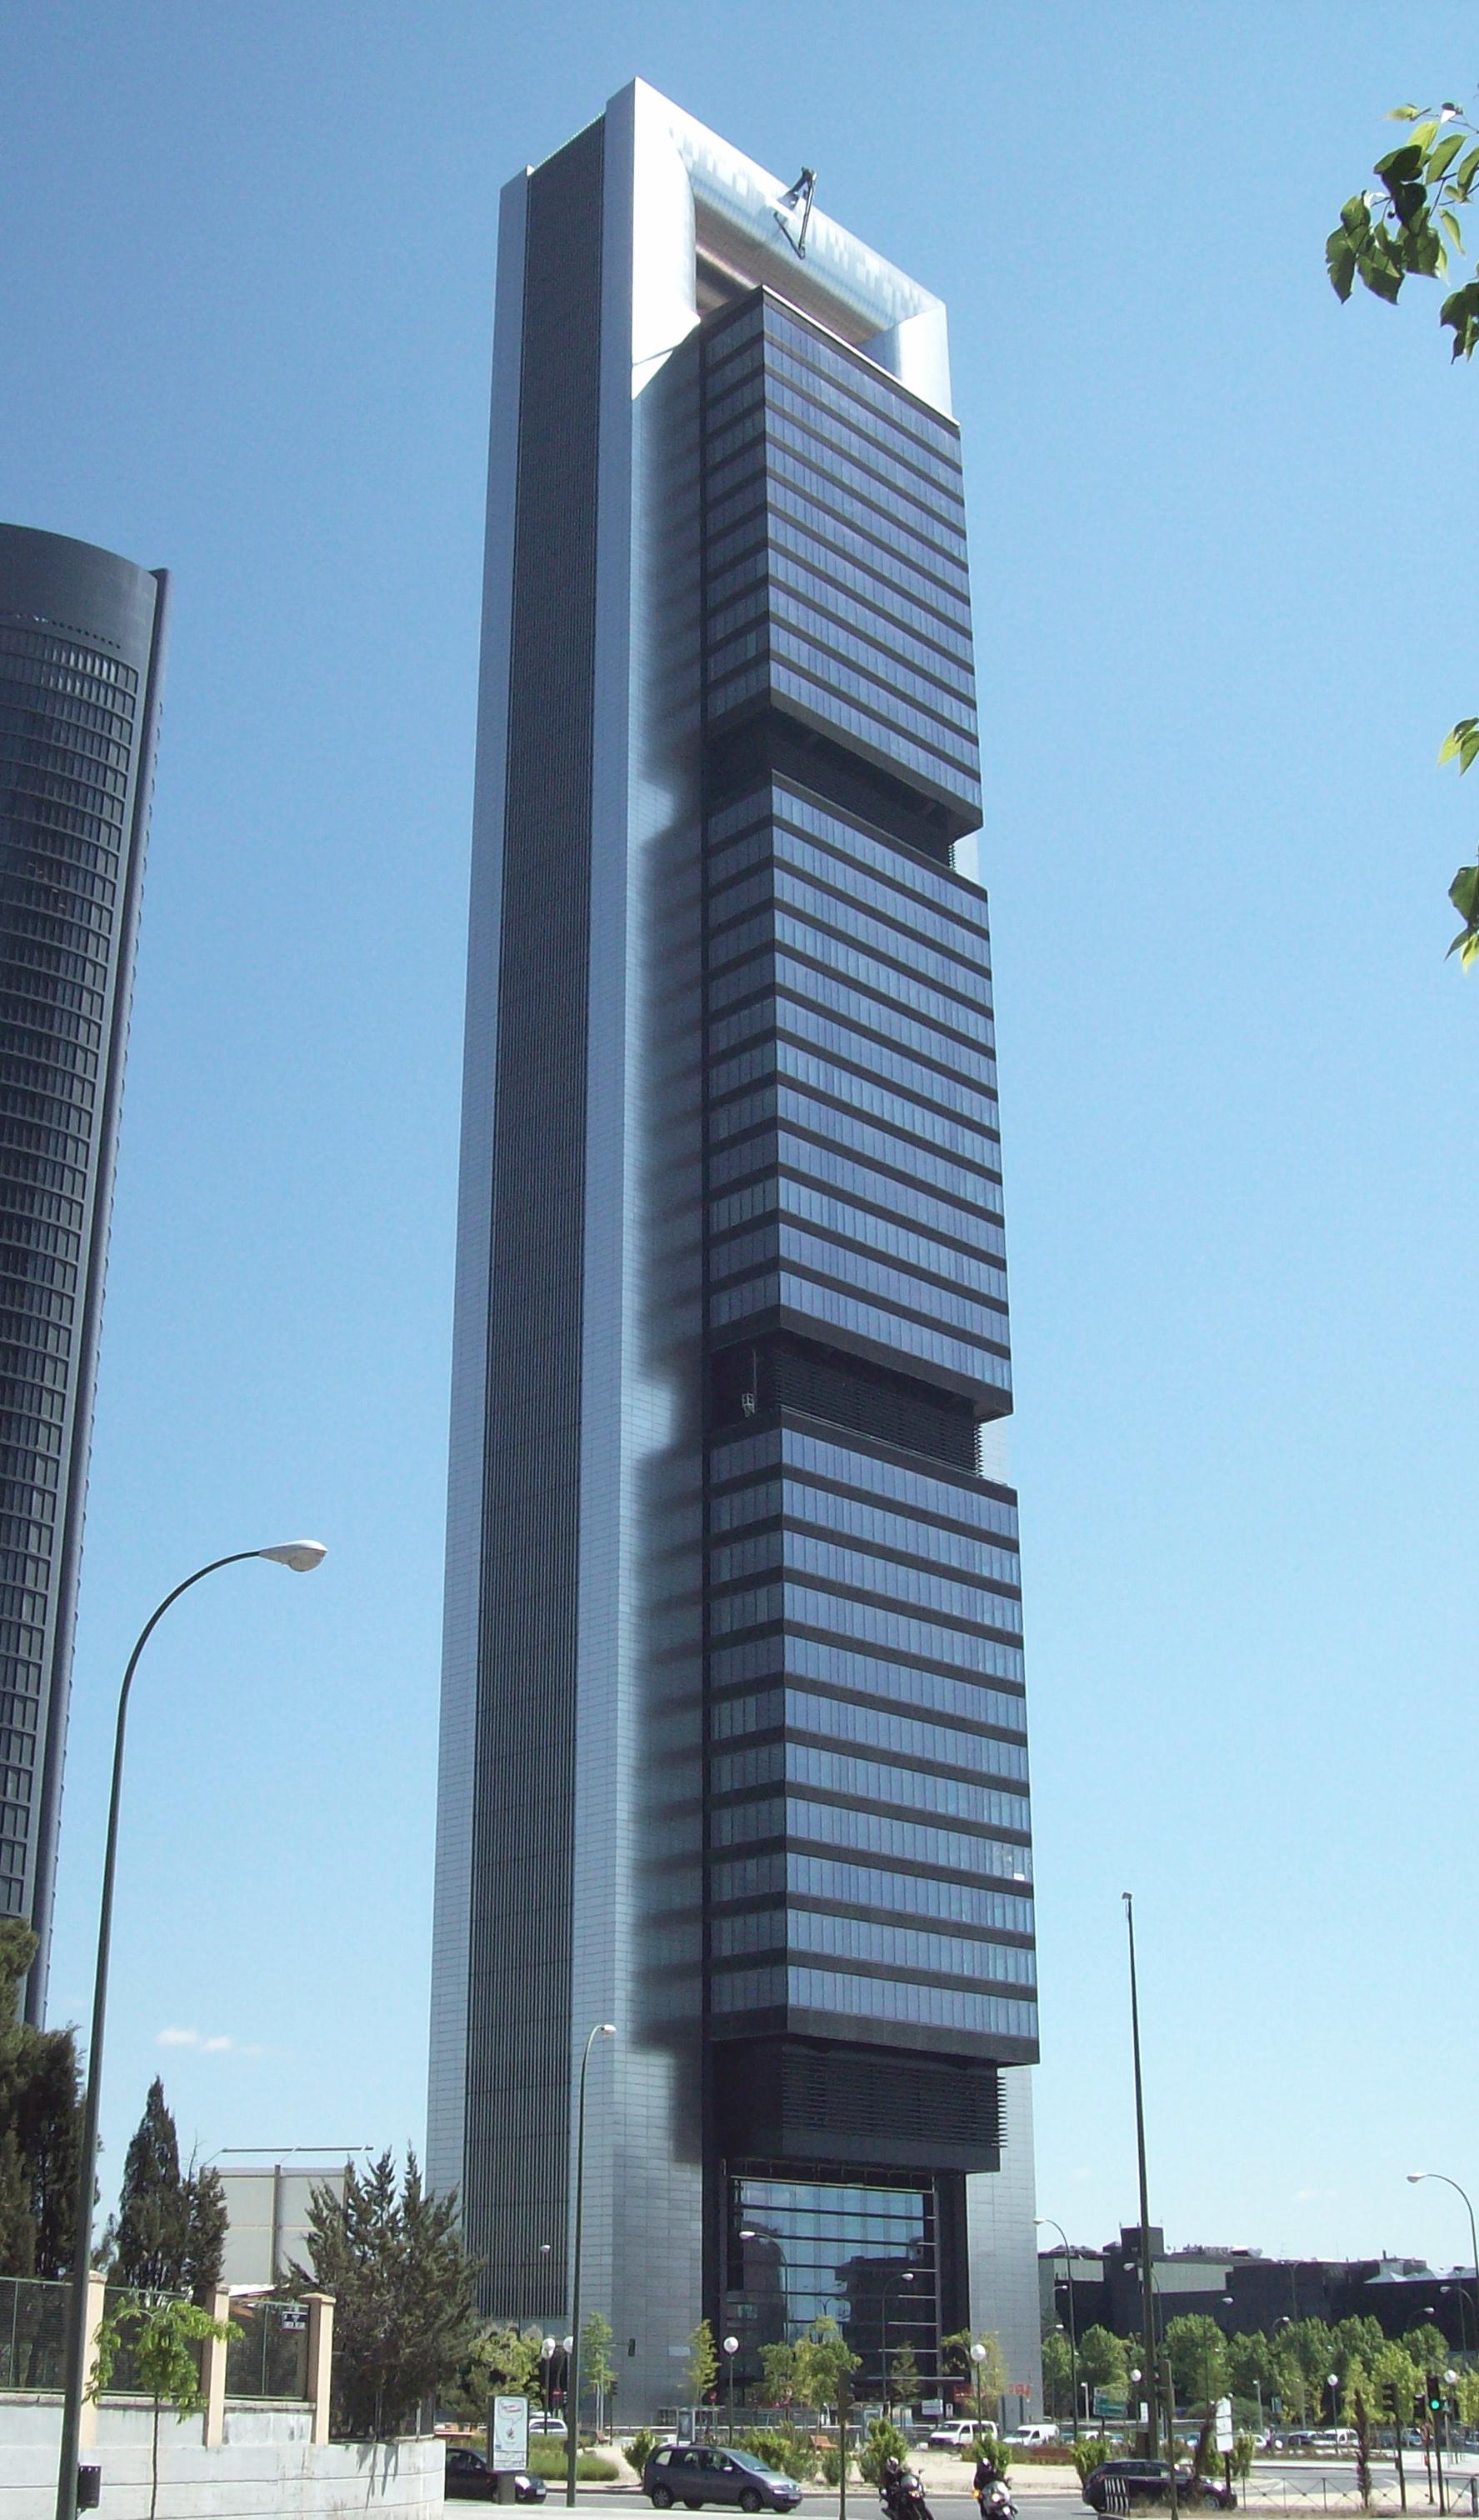 Torre cepsa wikipedia for Caja madrid particulares oficina internet